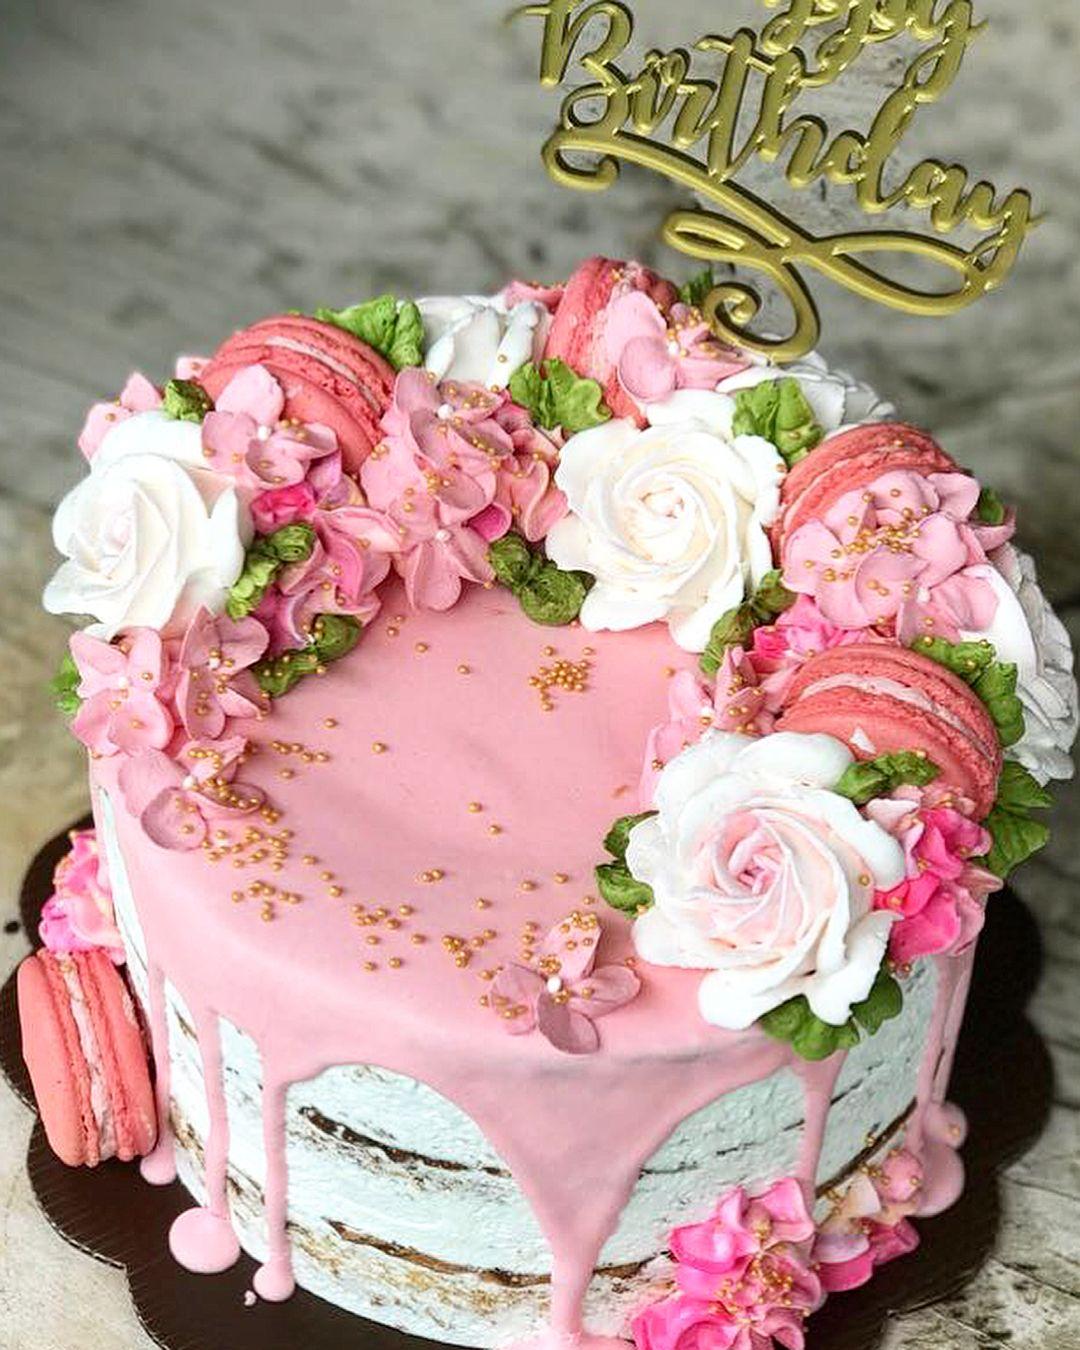 Birthday Cake Bandung : birthday, bandung, Bandung, #bandungjuara, #buttercreamcakes, #buttercreamflower, #kueulangtahun, #thecakeblogger, #kuebandung, #kekinianbanget, #birthda…, Cake,, Floral, Gorgeous, Cakes